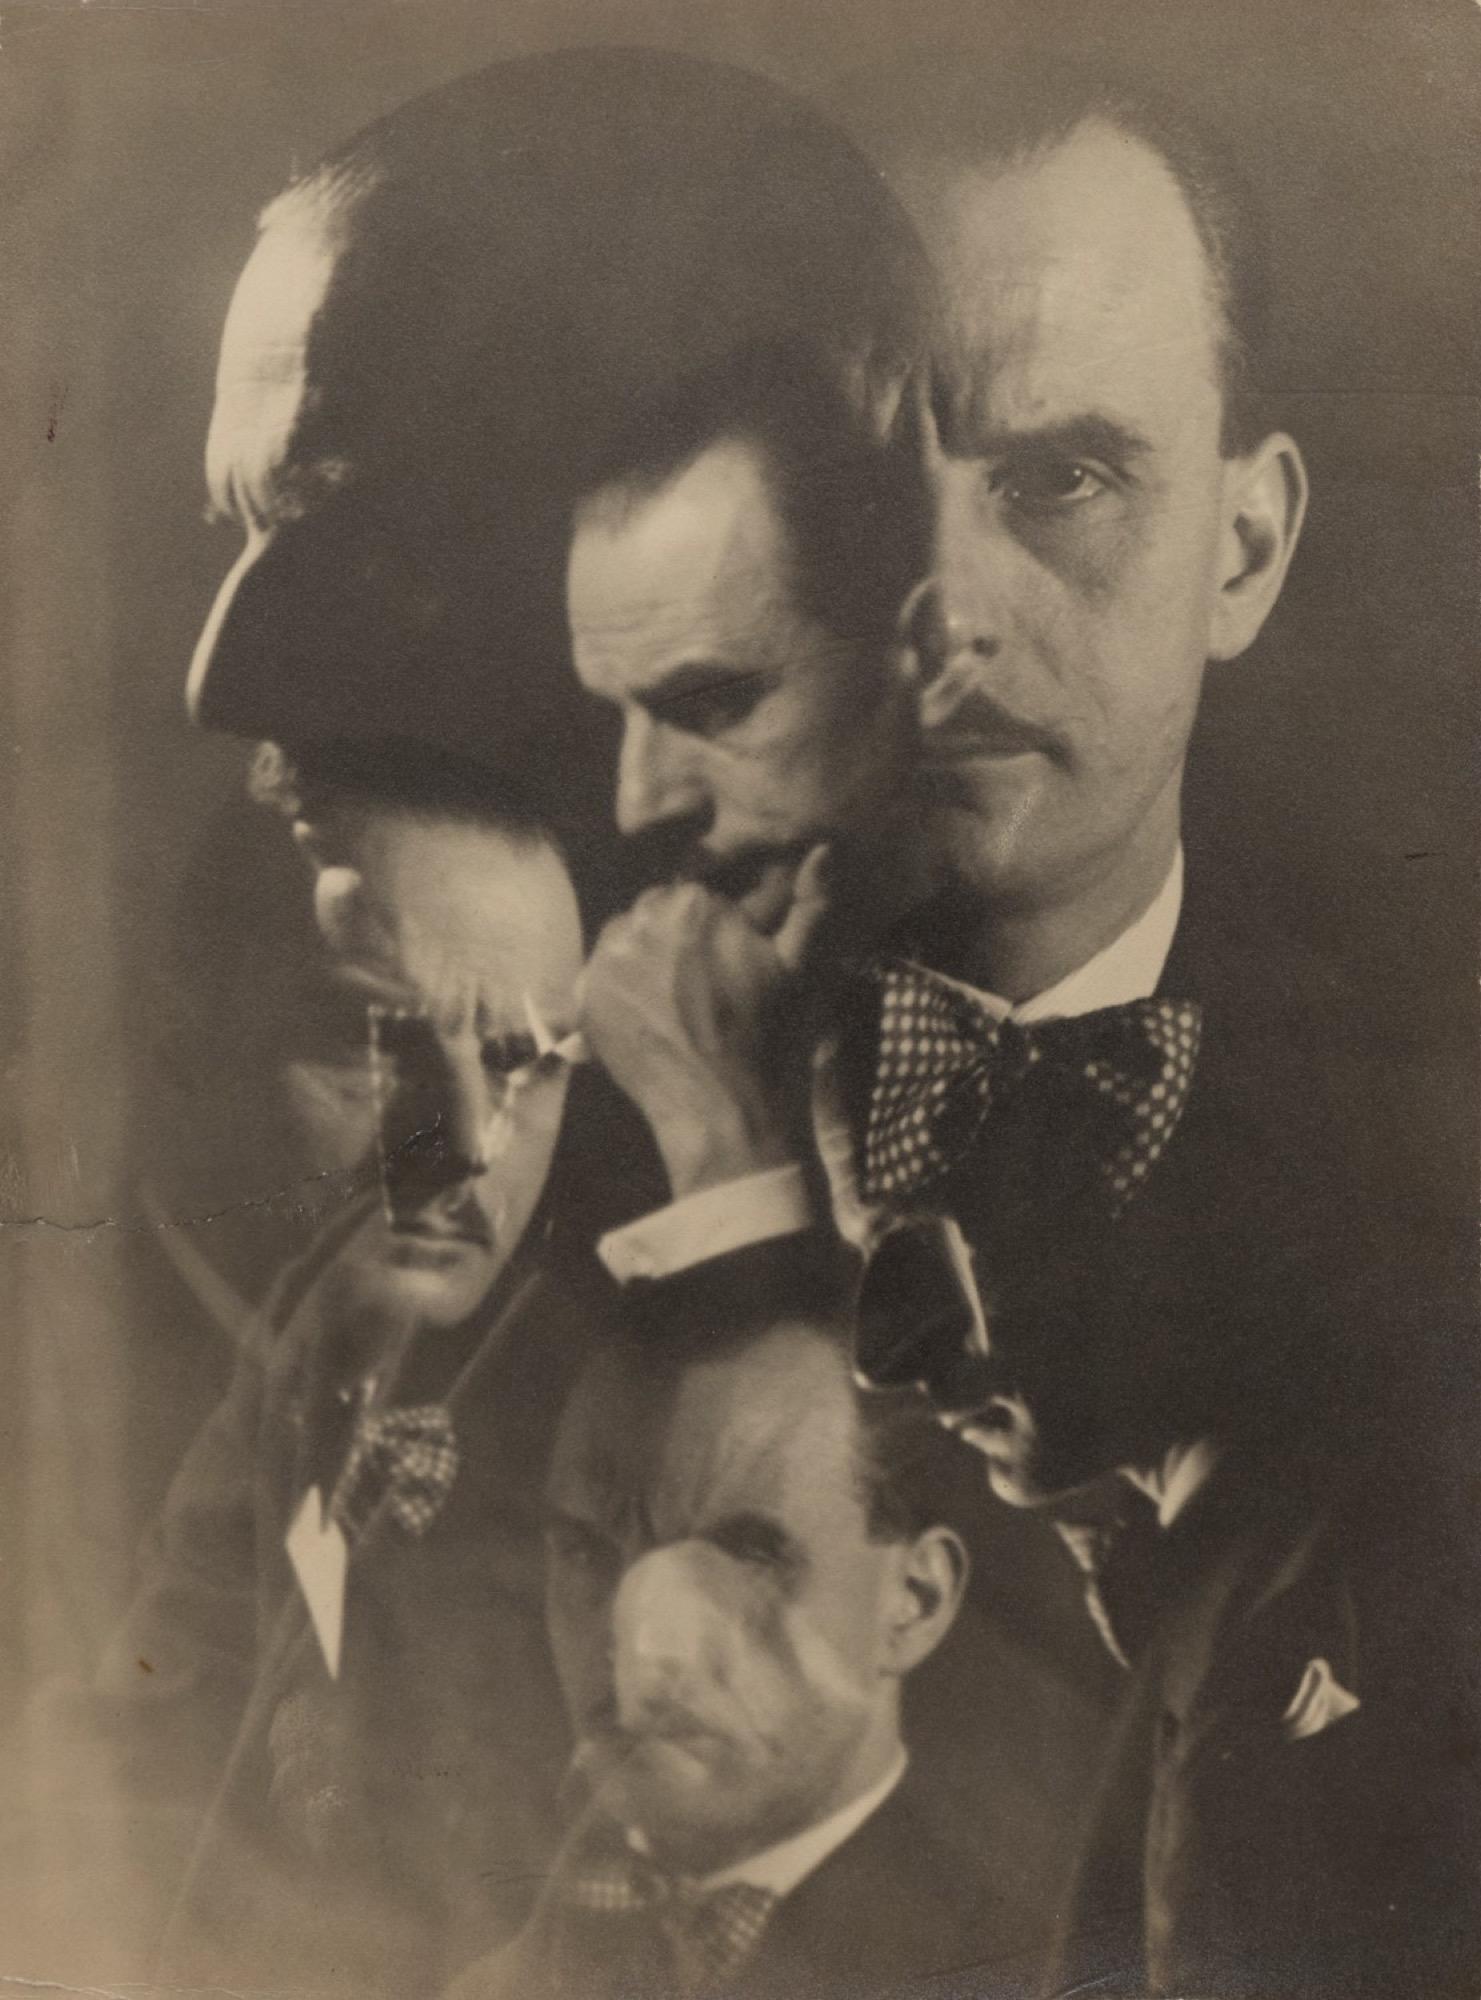 Anonimo - Sergio Tofano, photomontage, years 1930 - Vintage gelatin silver print - [...]